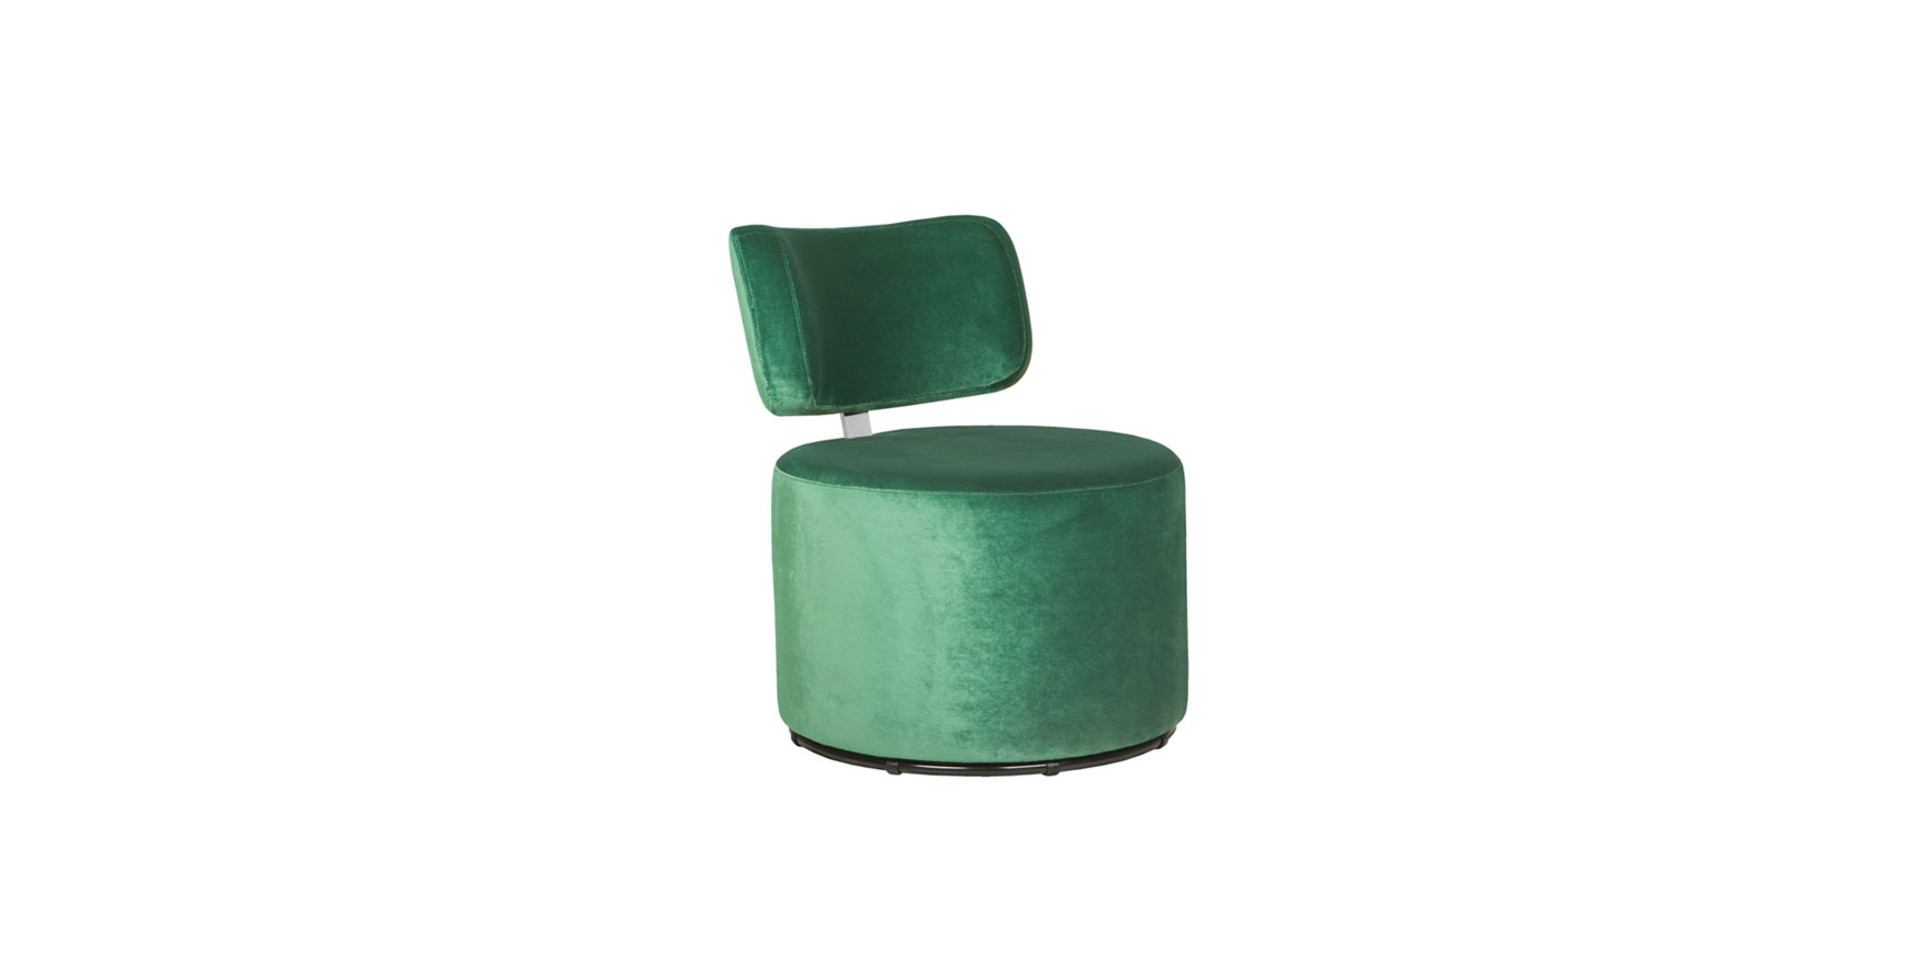 sits-mokka-fauteuil-armchair_swivel_classic_velvet15_green_2_0